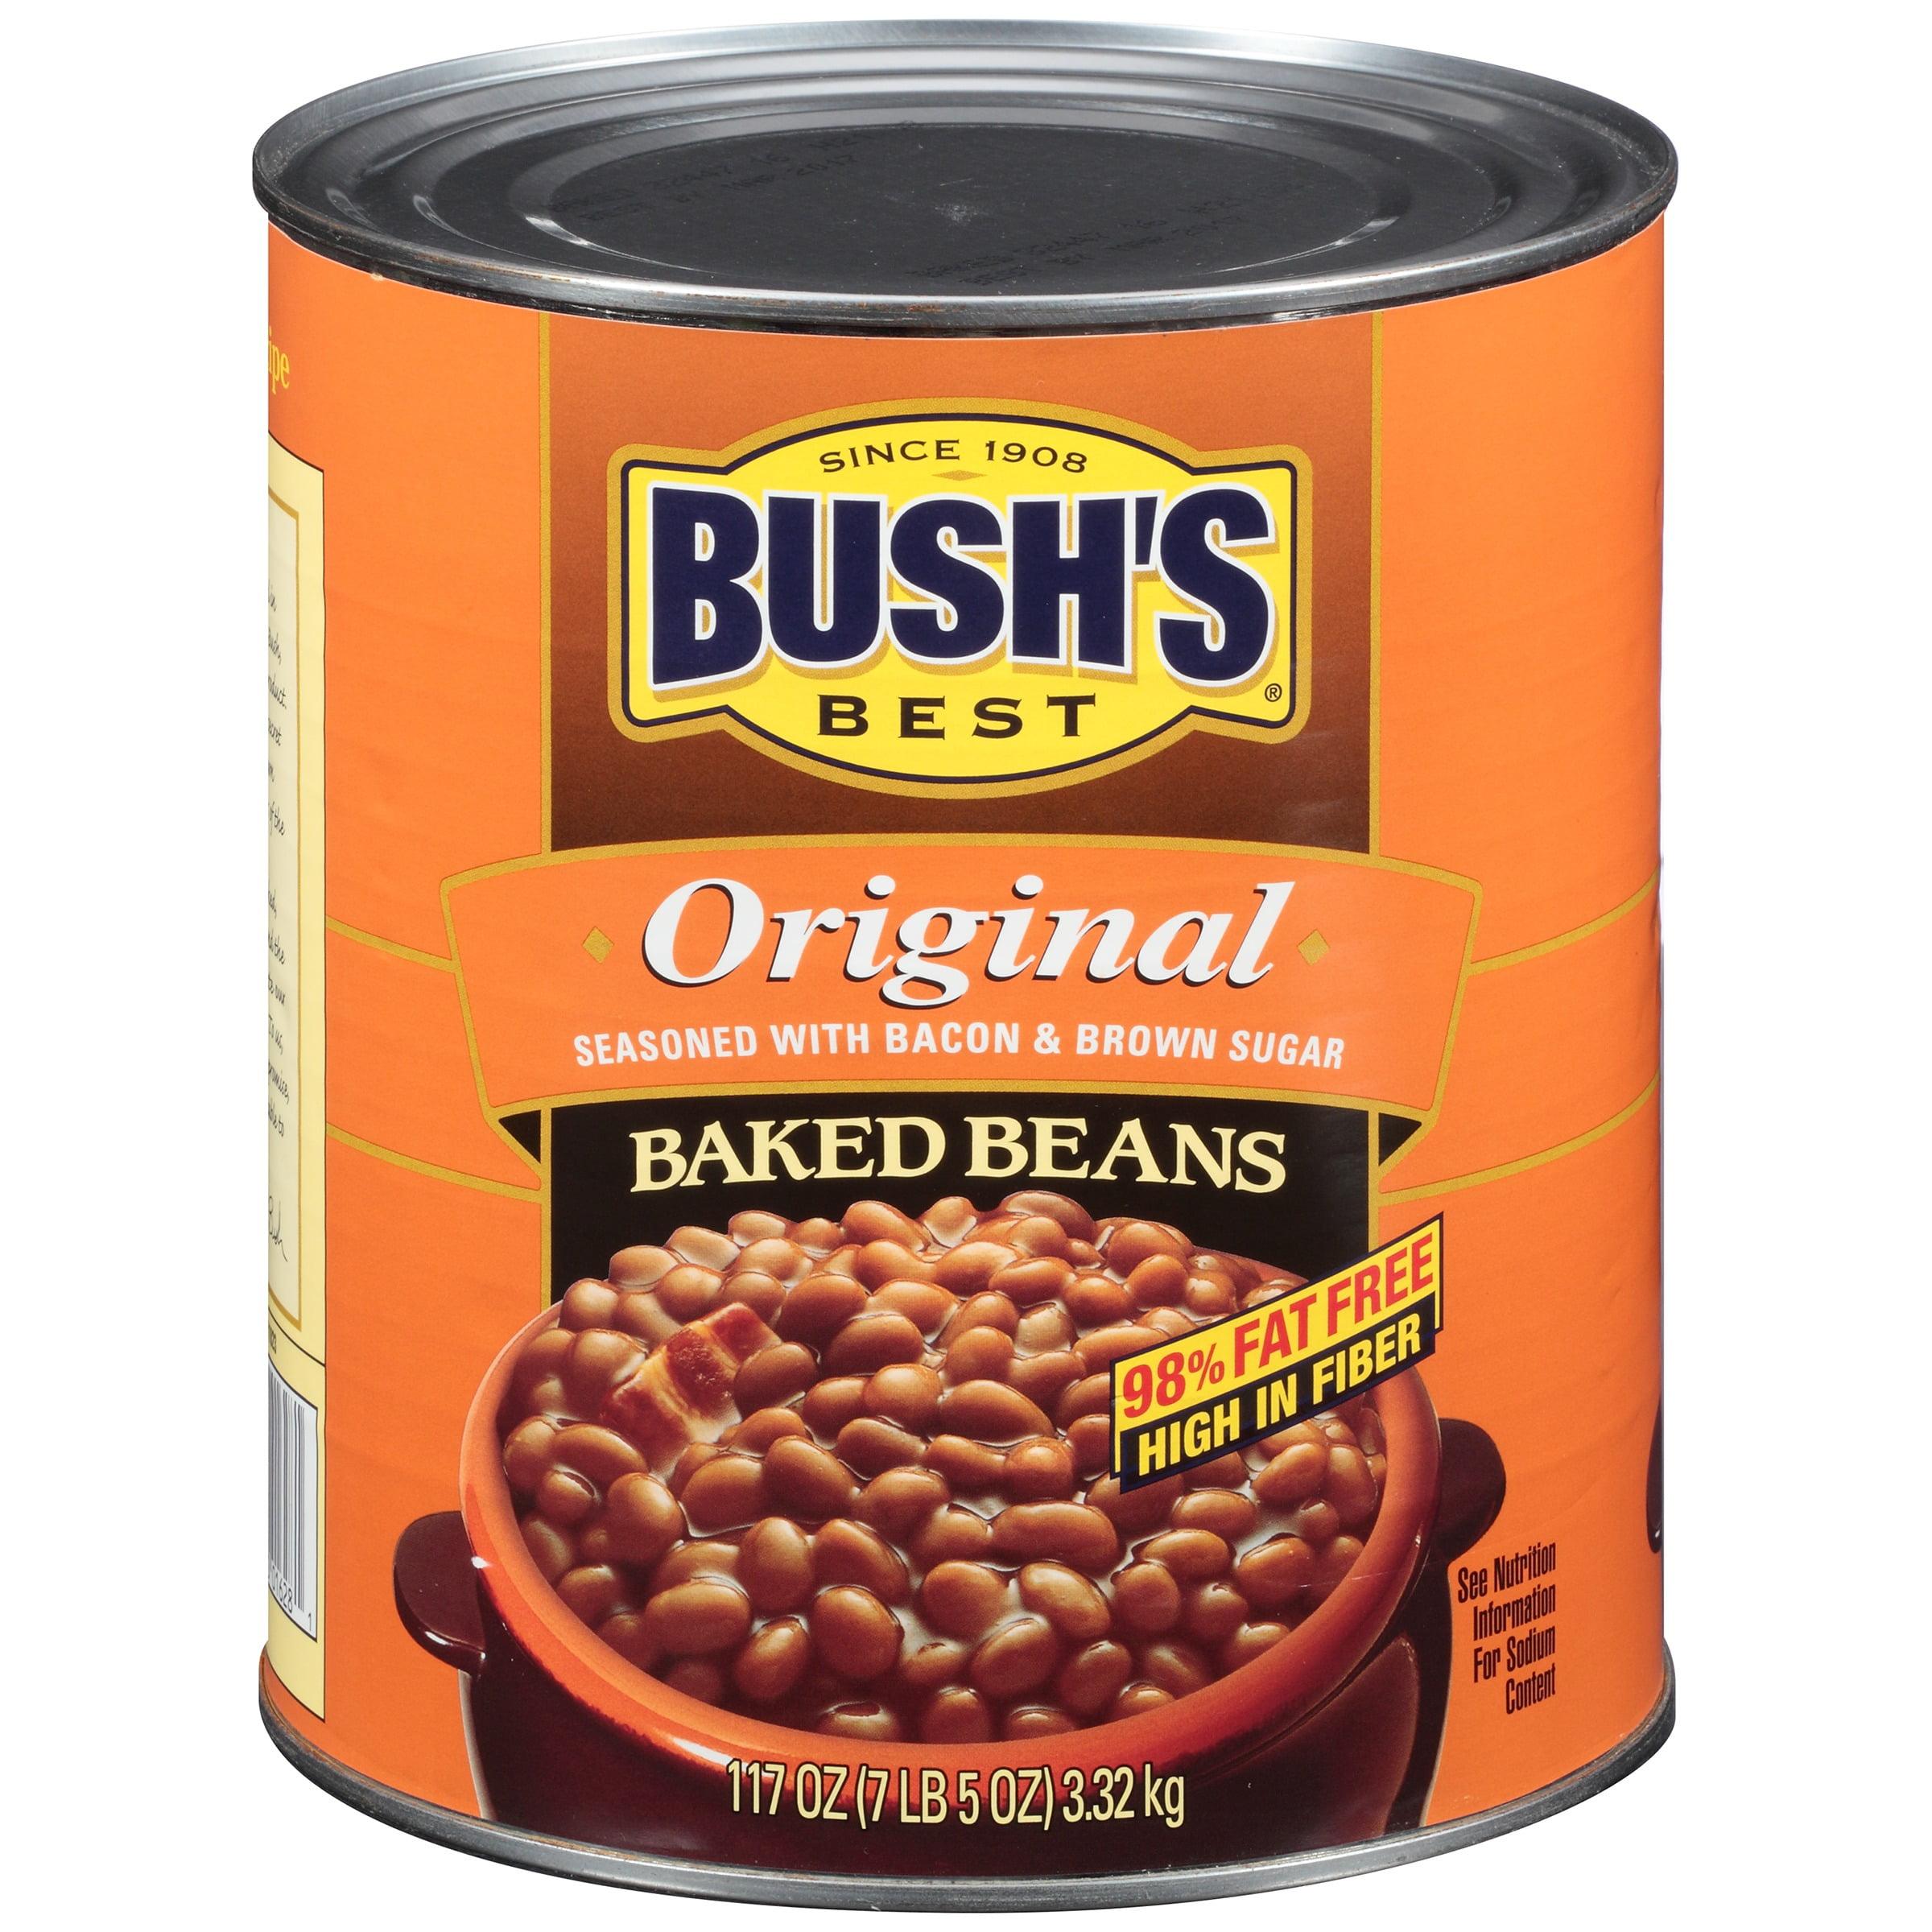 BUSH'S BEST Original Baked Beans, 117.0 OZ by Bush Brothers & Company